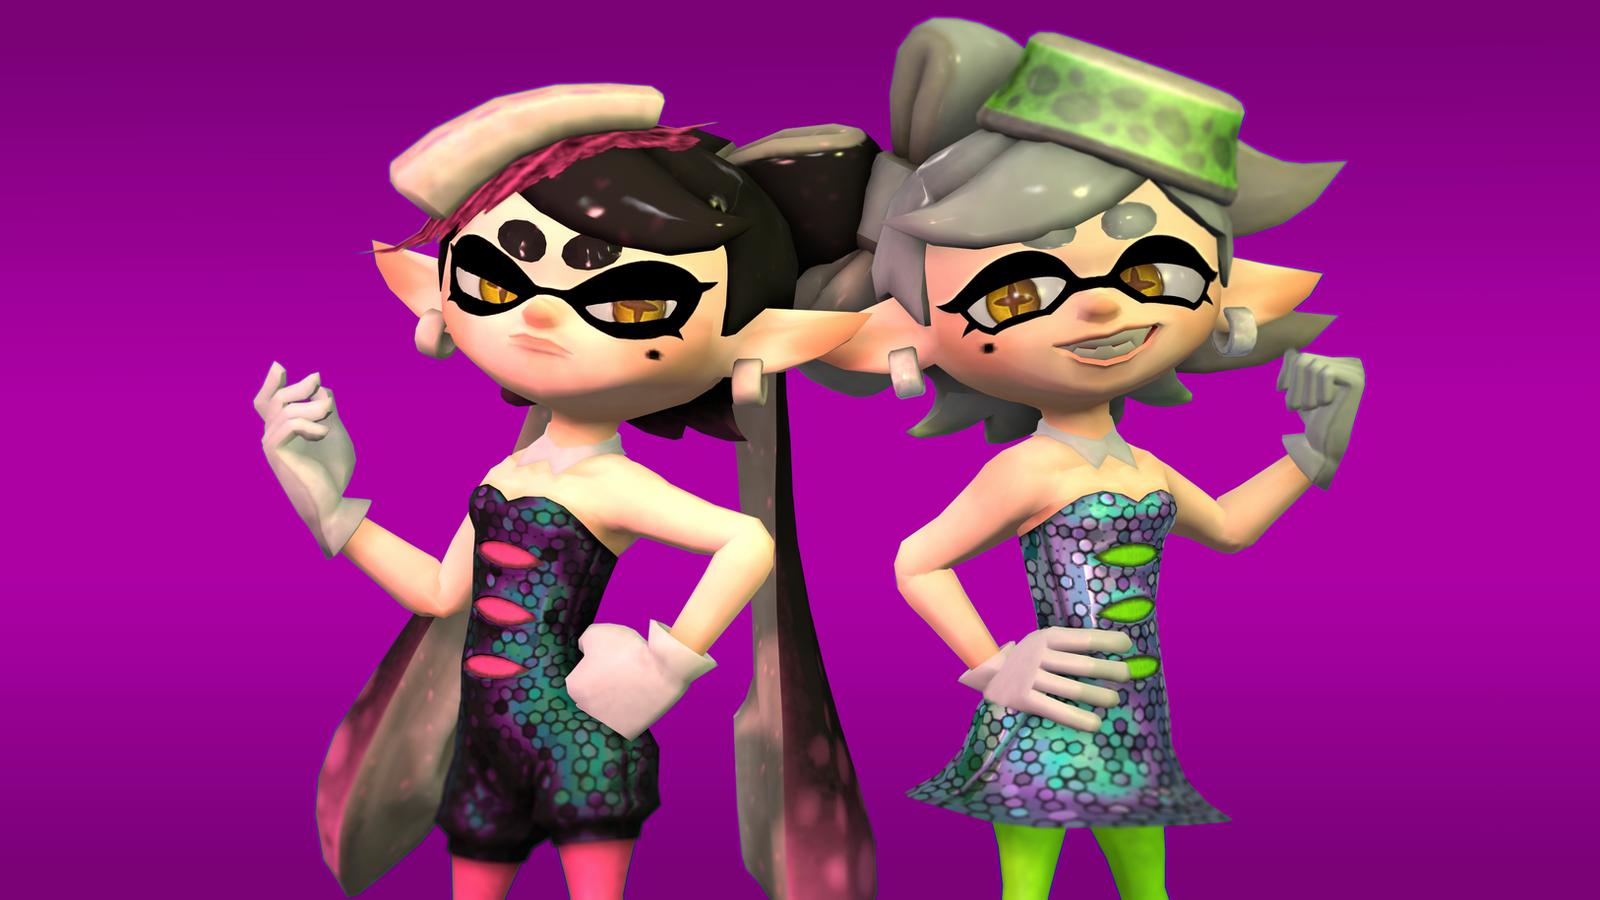 Callie And Marie Wallpaper: Squid Sisters (SFM) By Slava13 On DeviantArt